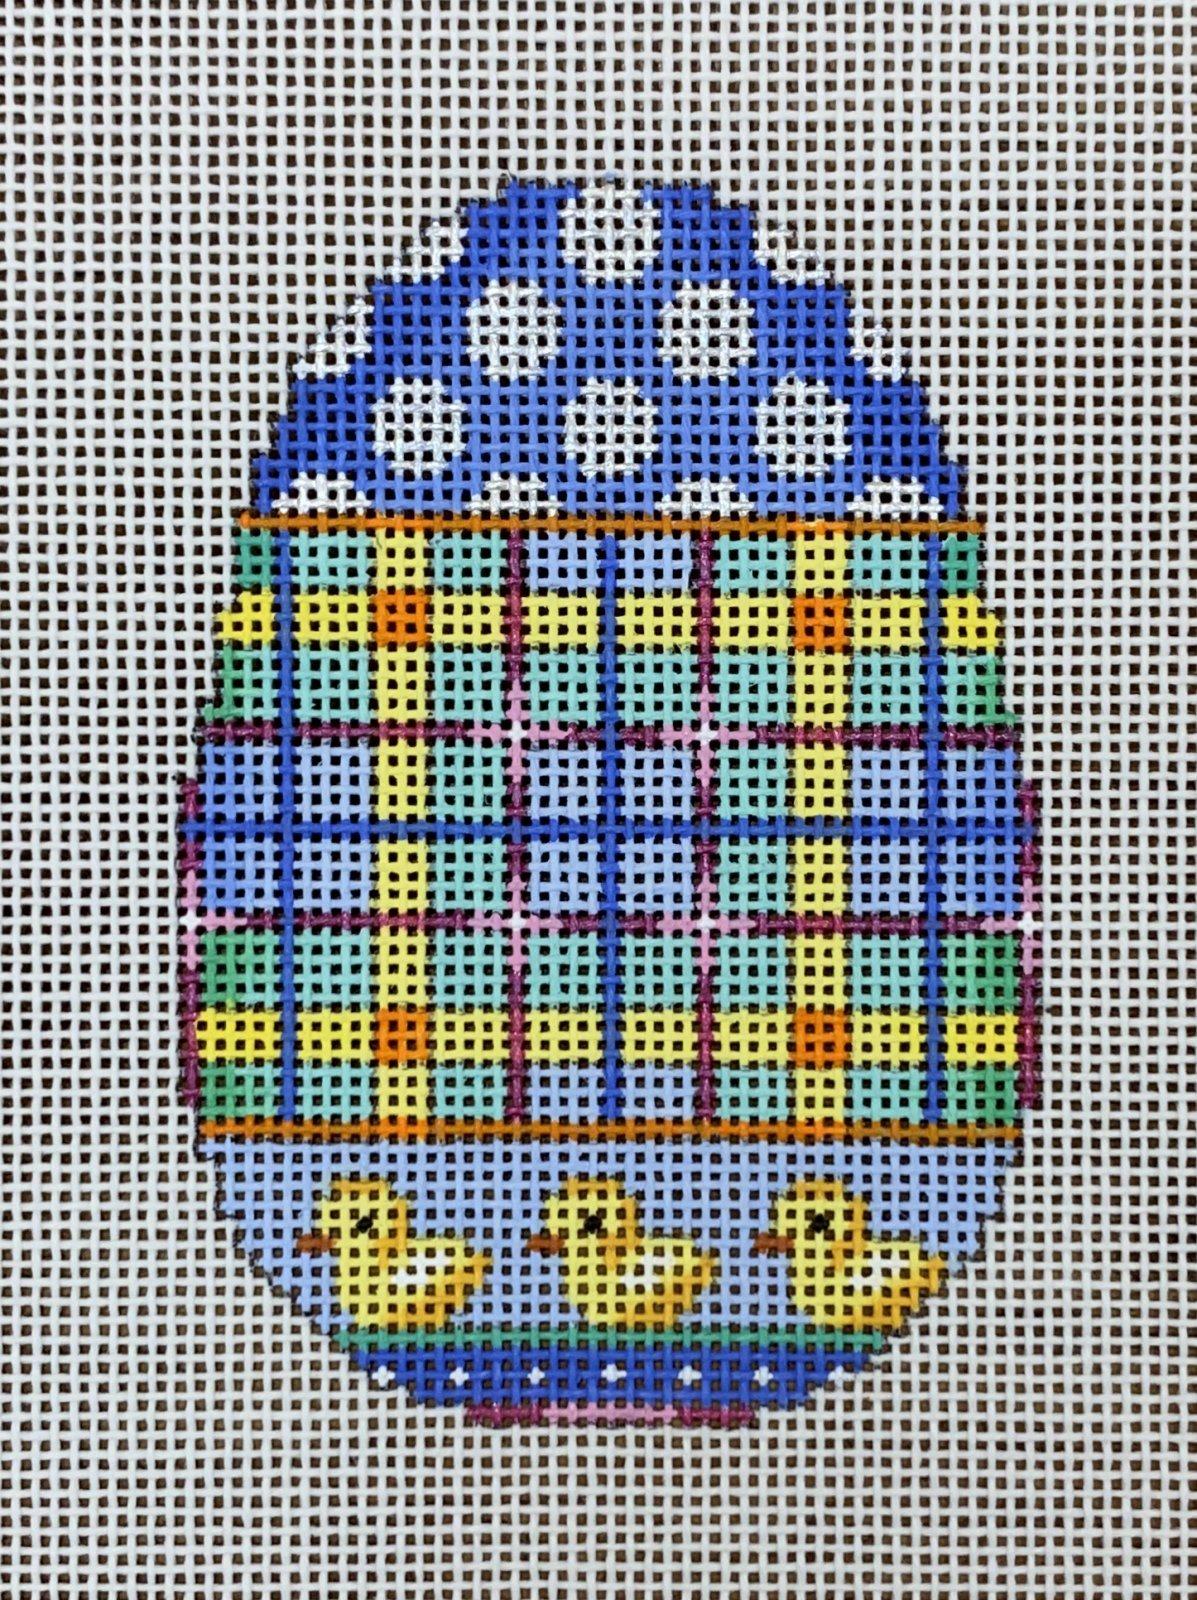 ATTSEG300 Chick/Dots/Plaid Egg